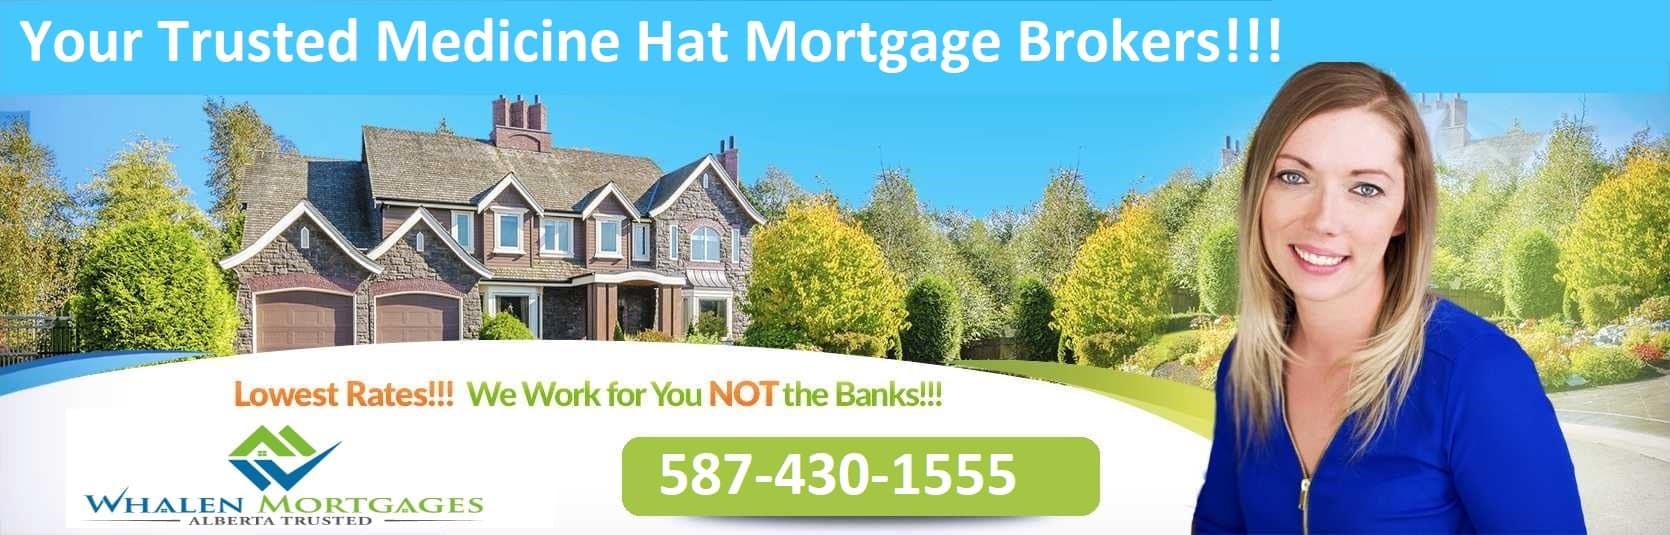 Medicine Hat Mortgage Broker : Medicine Hat Mortgage